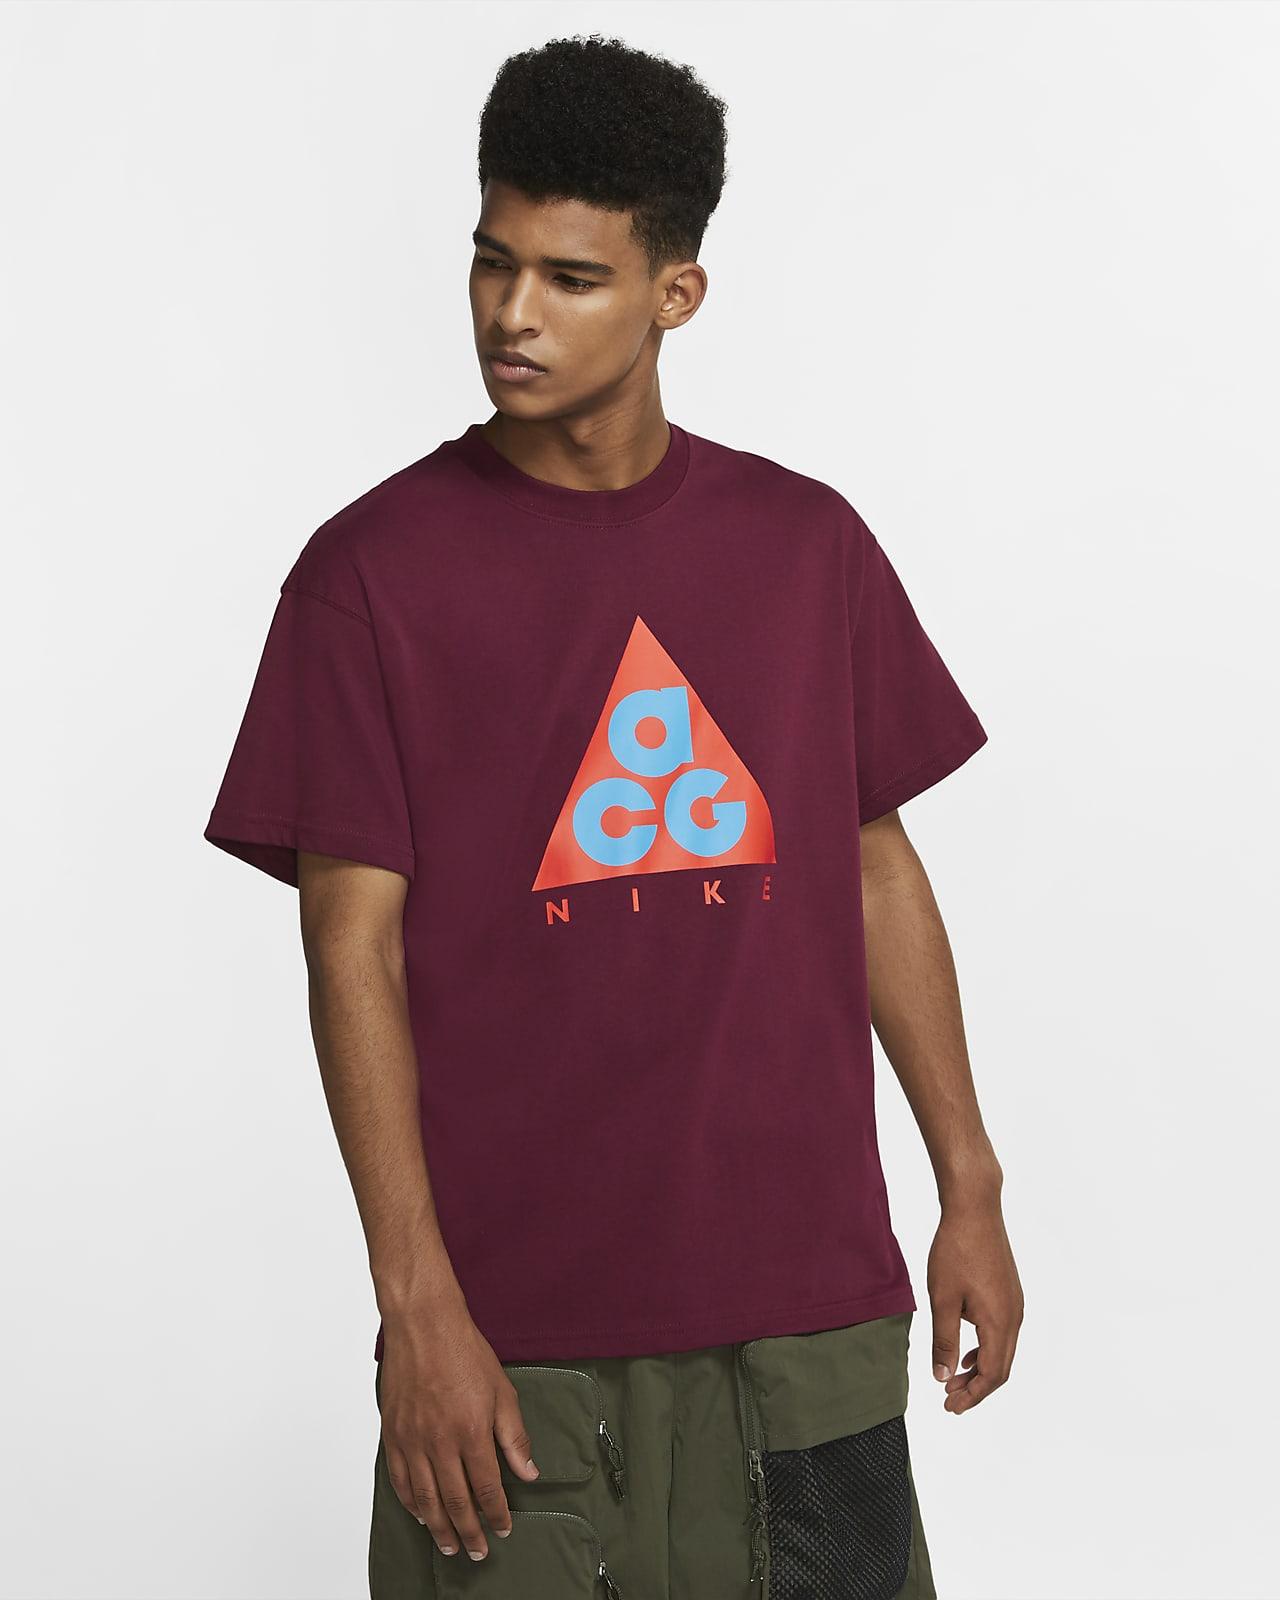 Nike ACG Men's Graphic T-Shirt